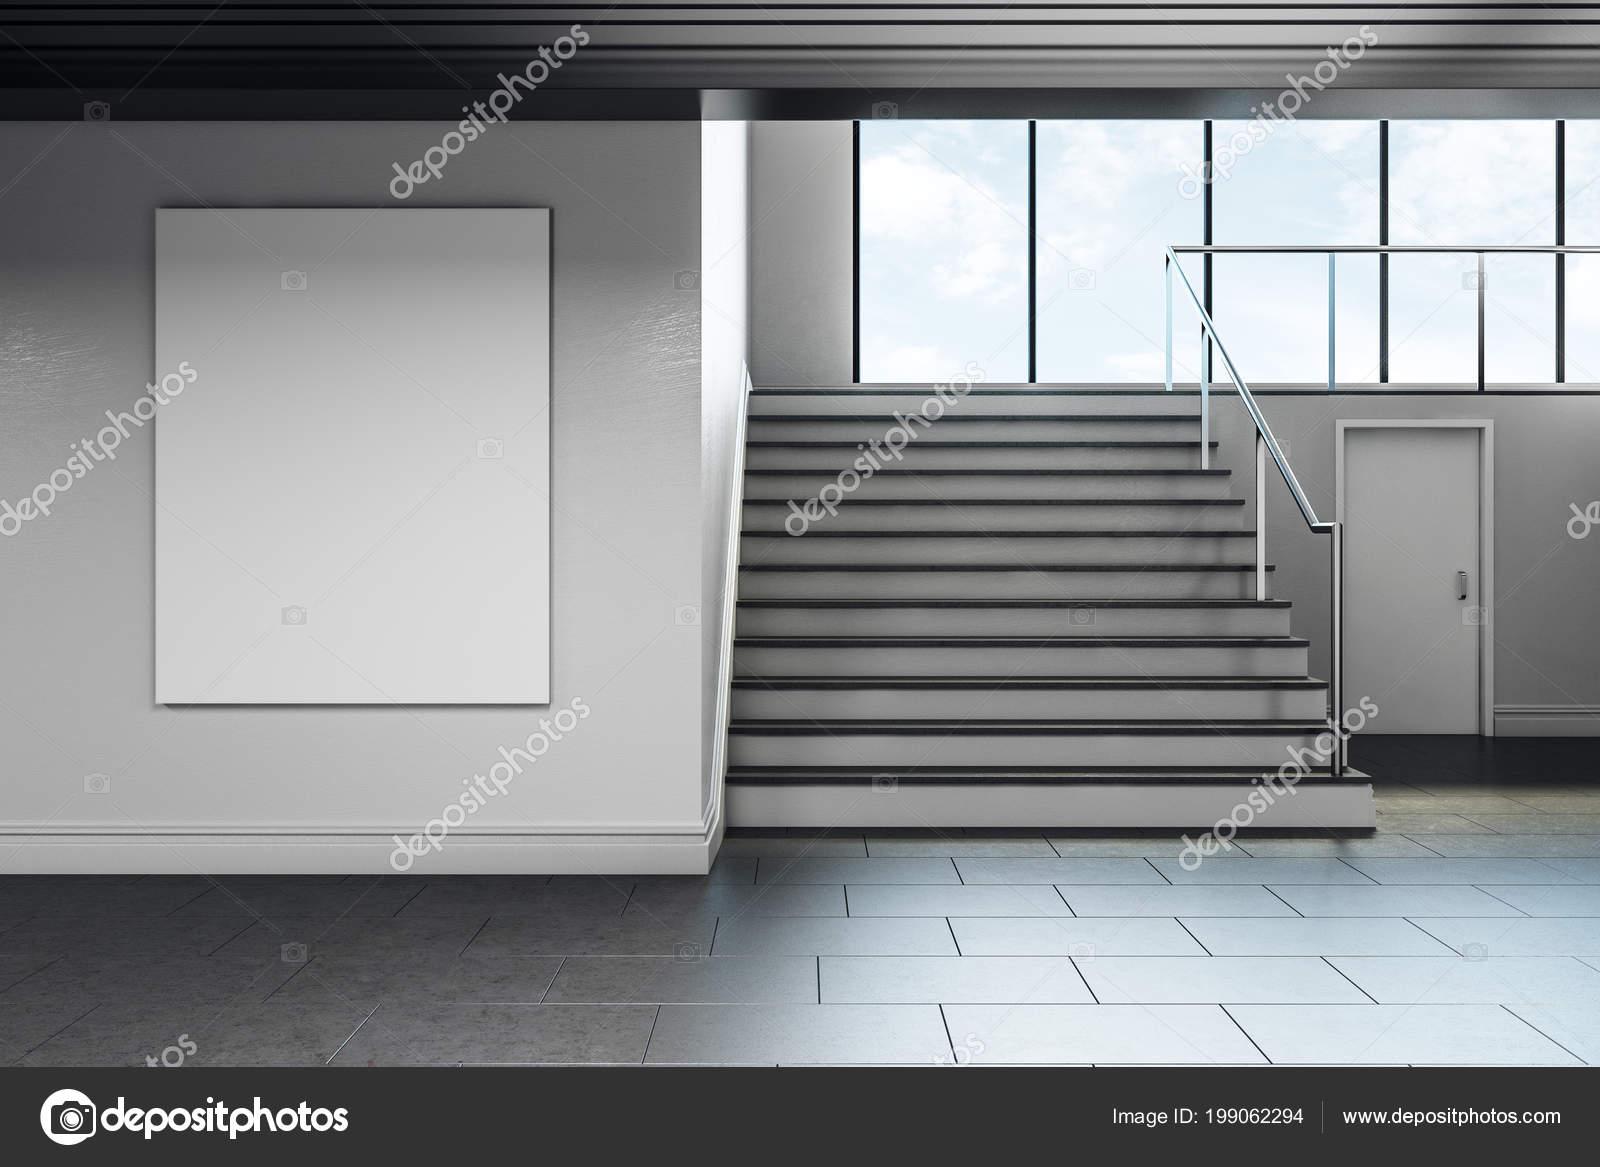 Moderne schule flur interieur mit leeren poster wand werbung